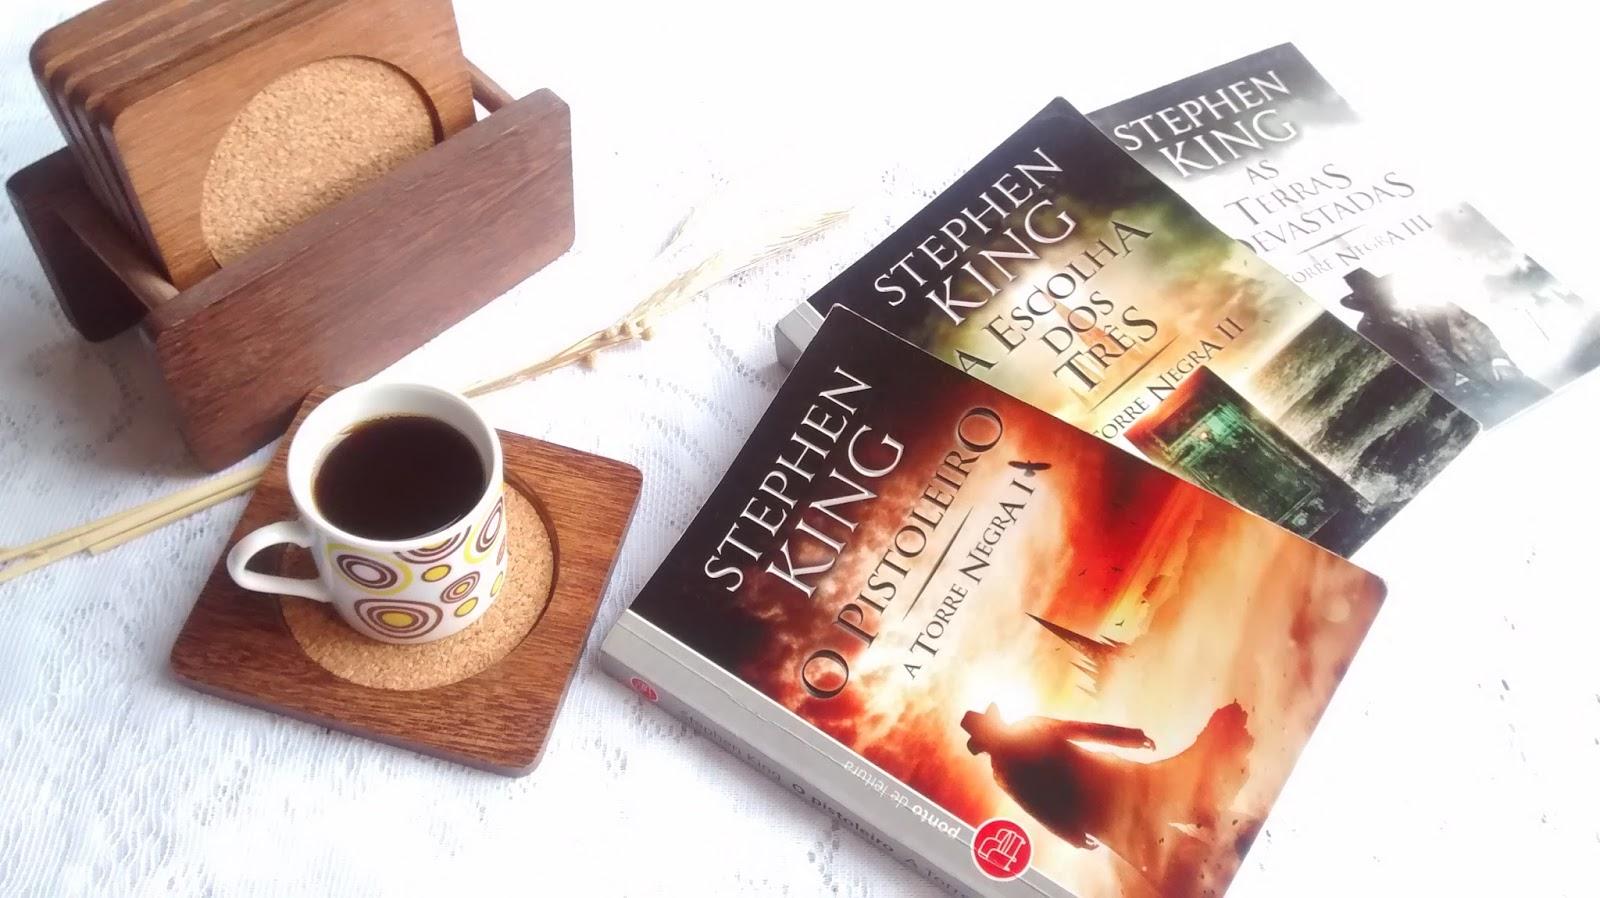 { RESENHA } O PISTOLEIRO - STEPHEN KING - A TORRE NEGRA #1